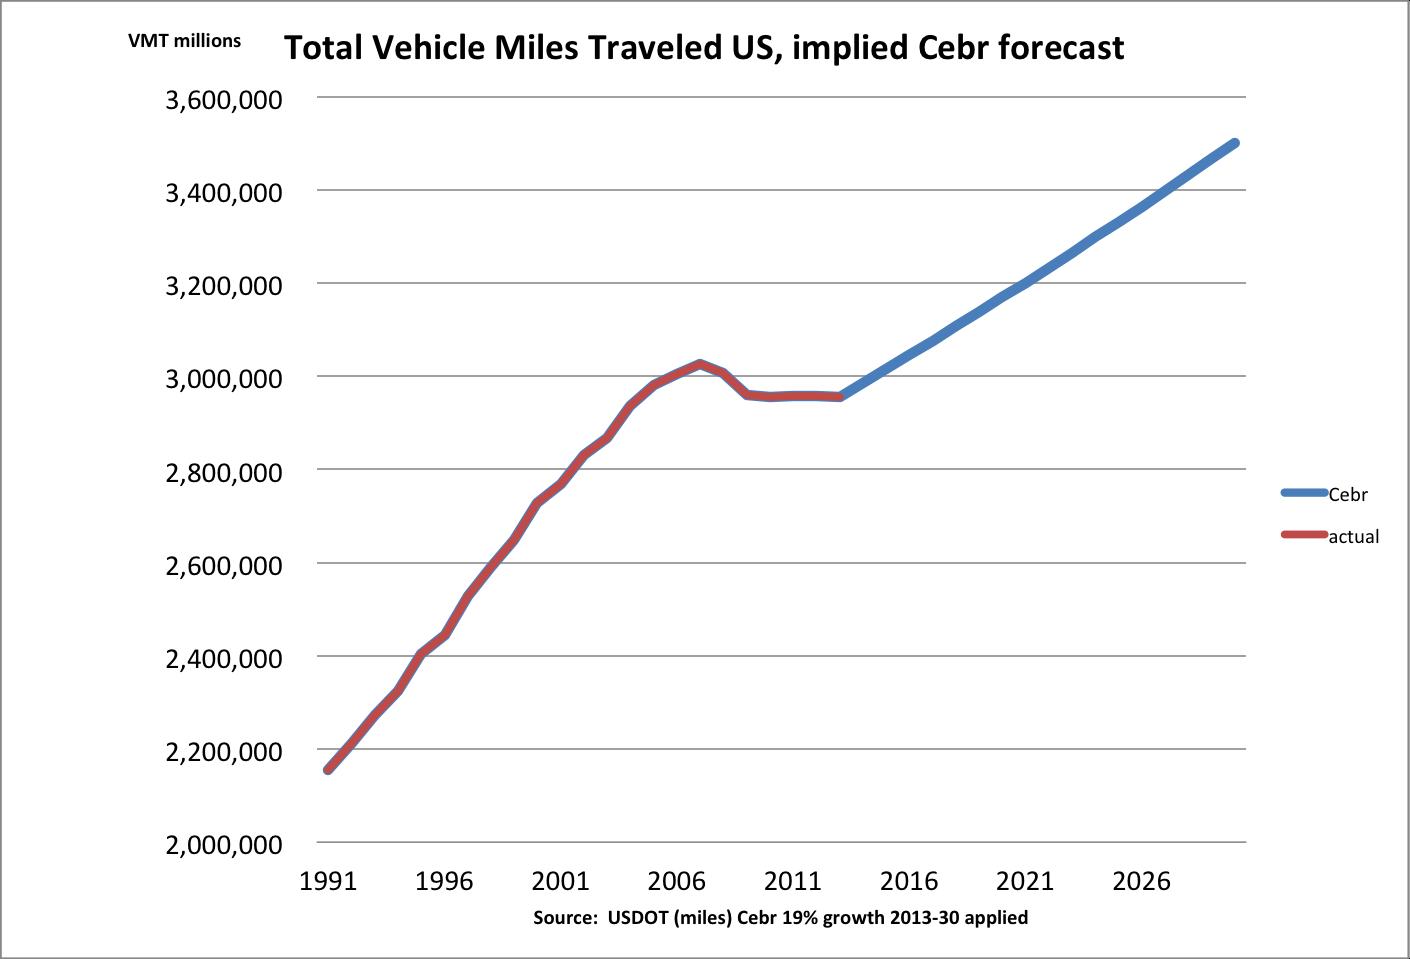 CEBR_forecast_2030